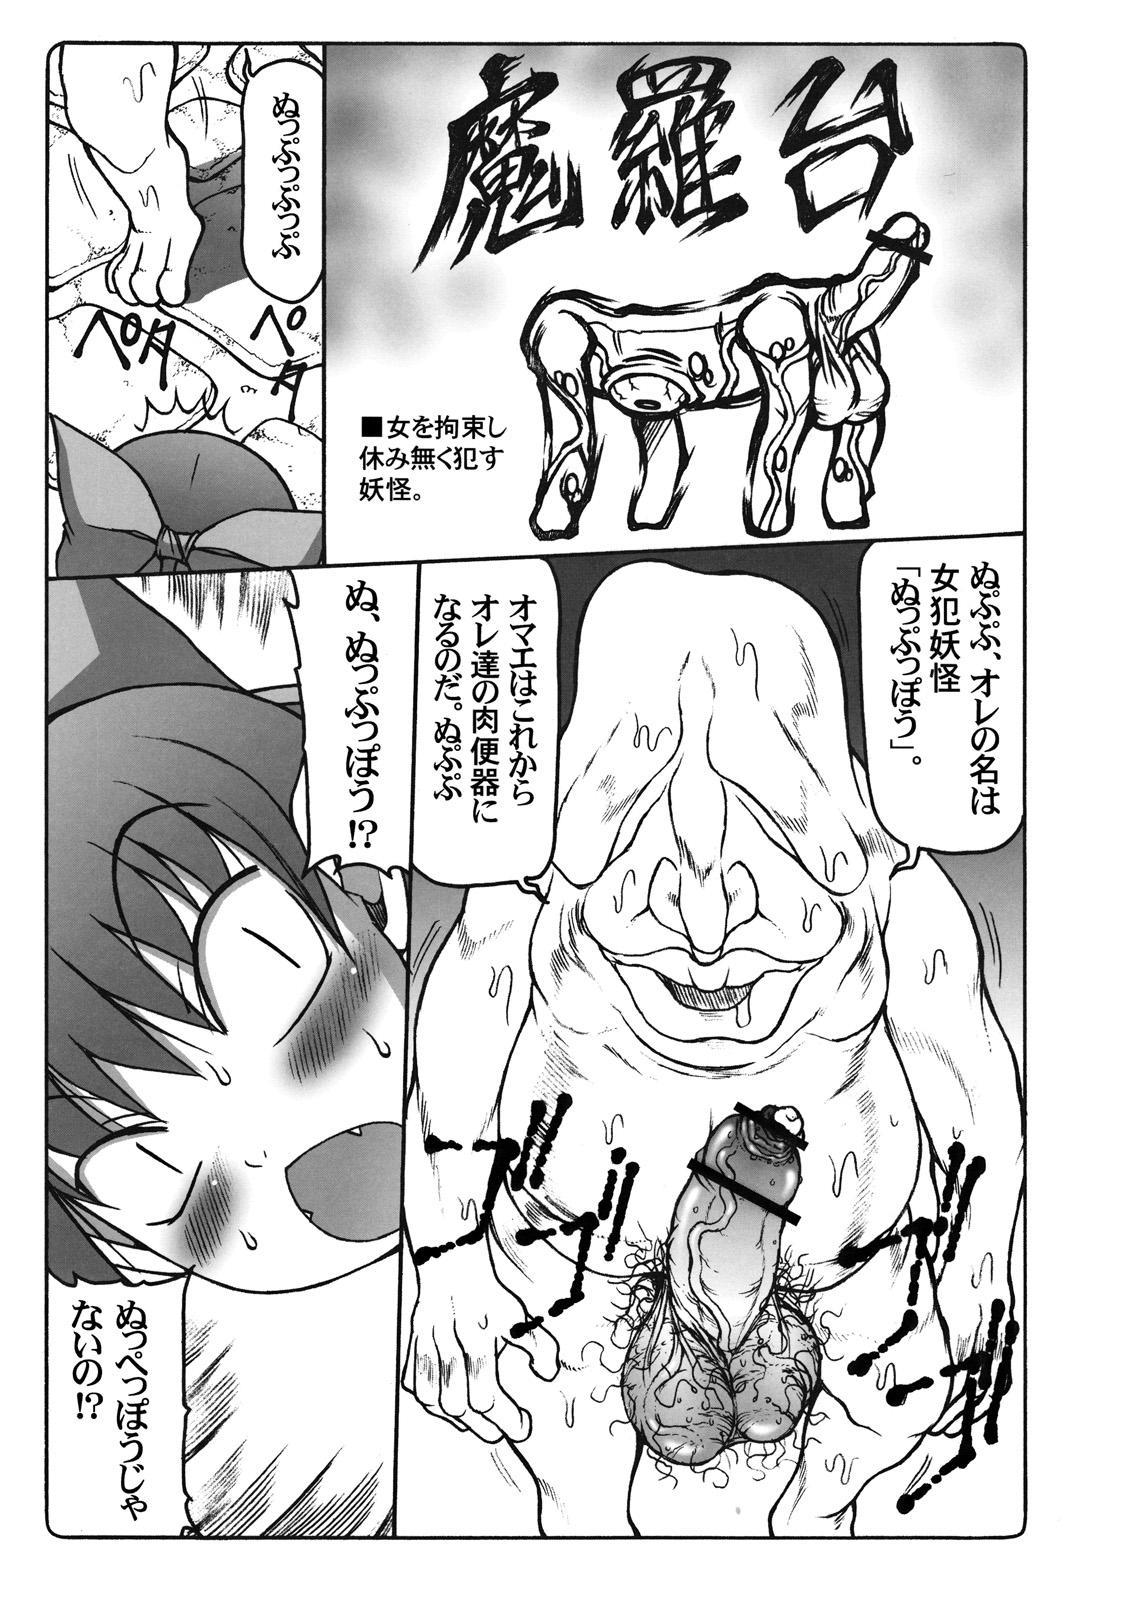 Nuko Musume VS Youkai Nuppuppou 5